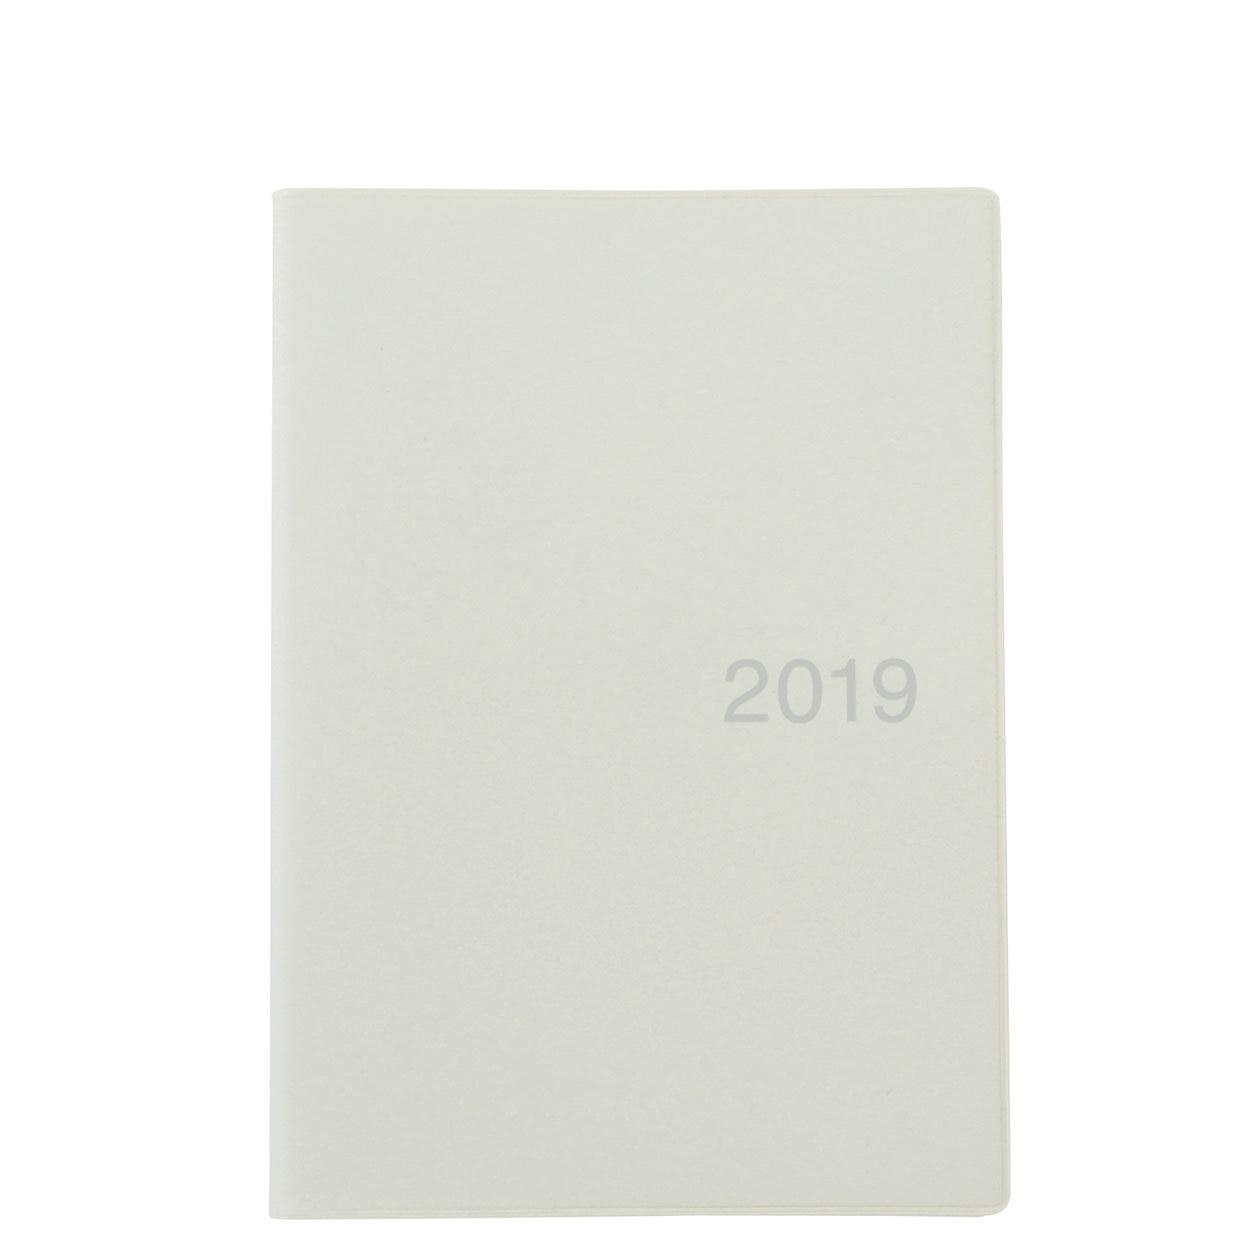 RoomClip商品情報 - 上質紙マンスリーウィークリーノート・2018年12月始まり B6・ホワイトグレー